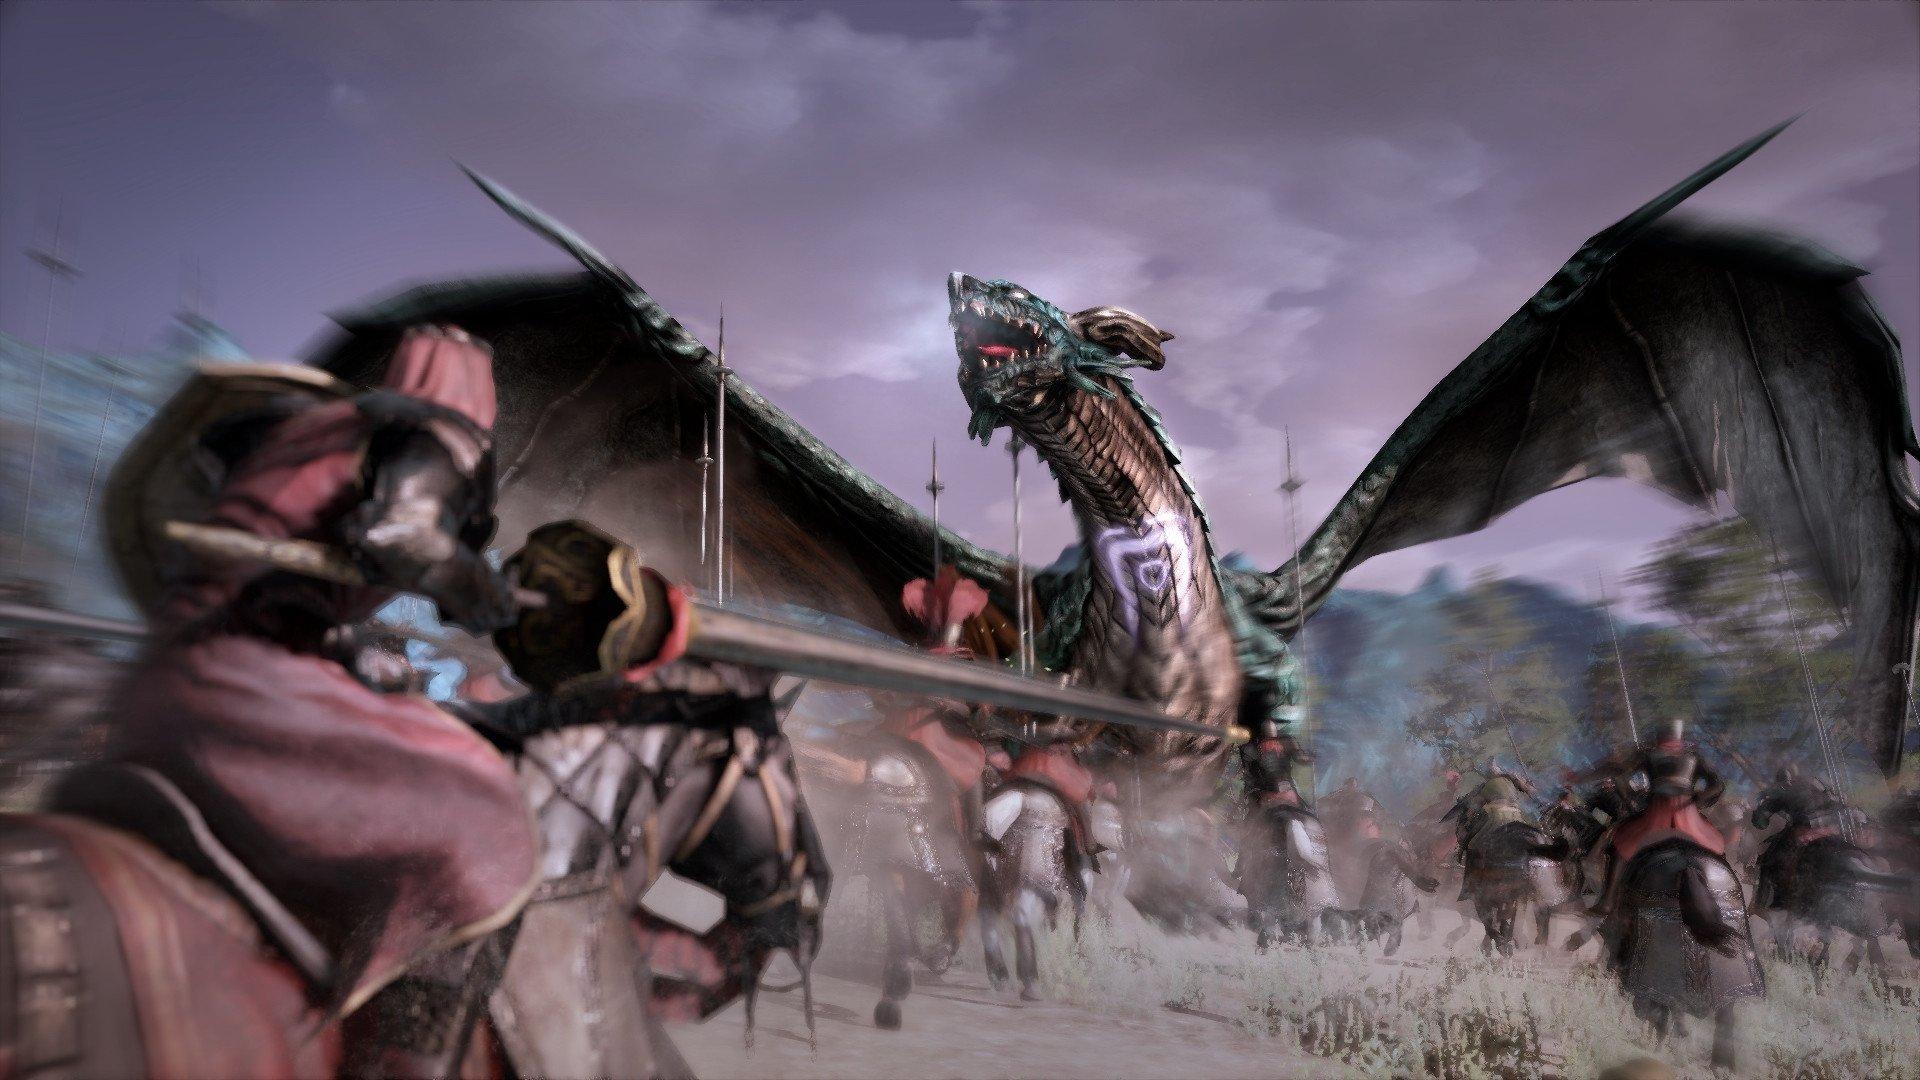 Dragon_Charge.jpg</a>